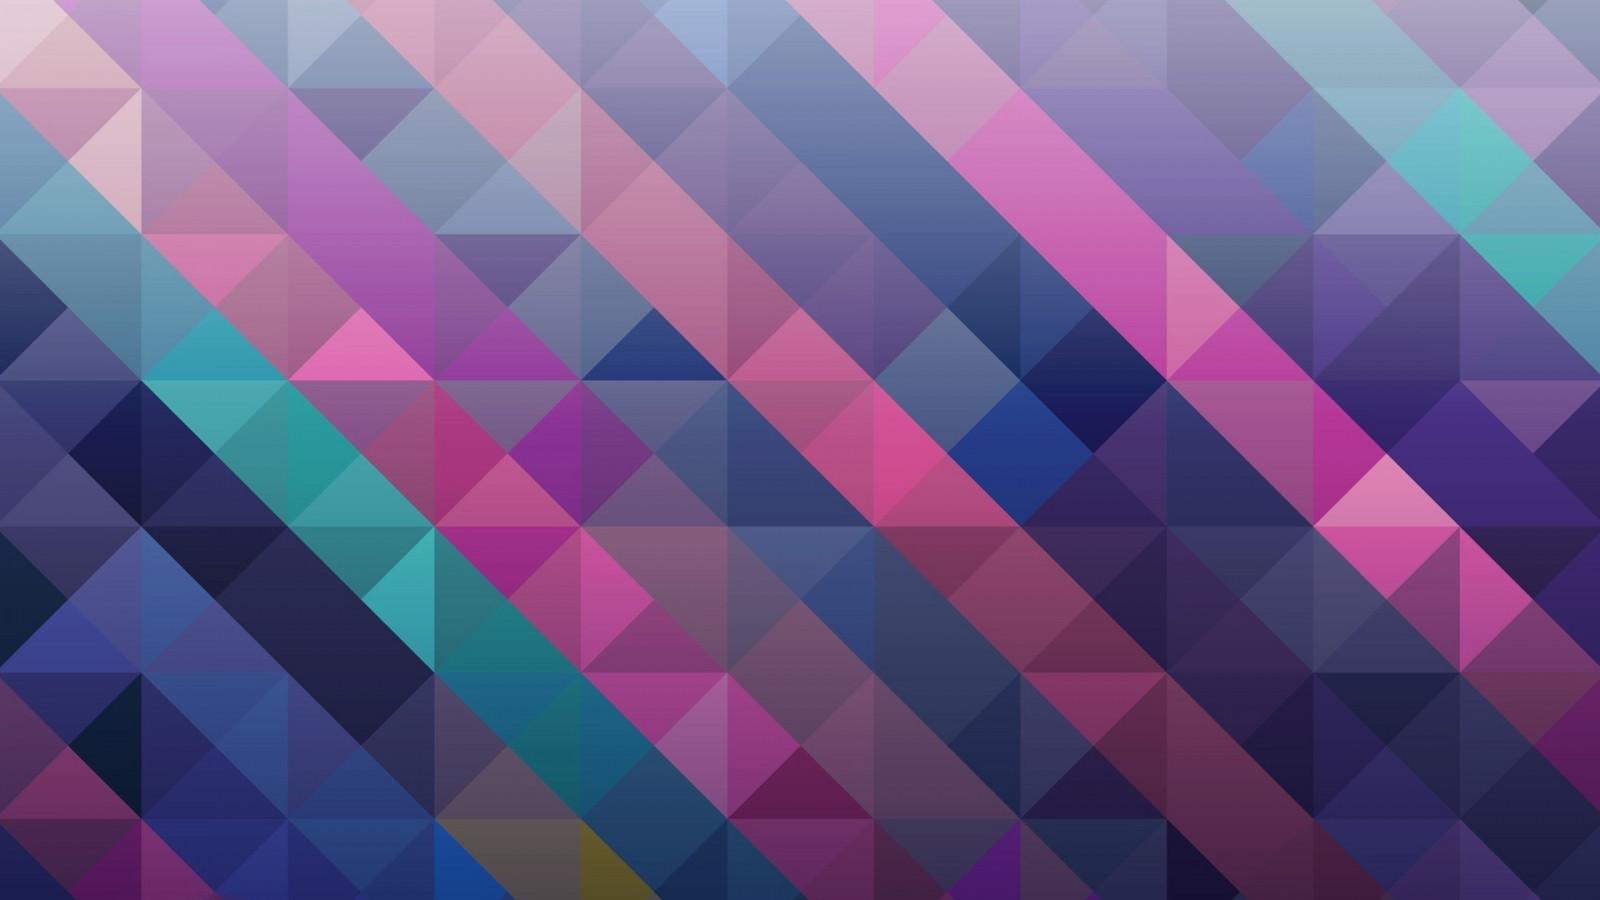 Wallpaper : colorful, digital art, abstract, minimalism ...